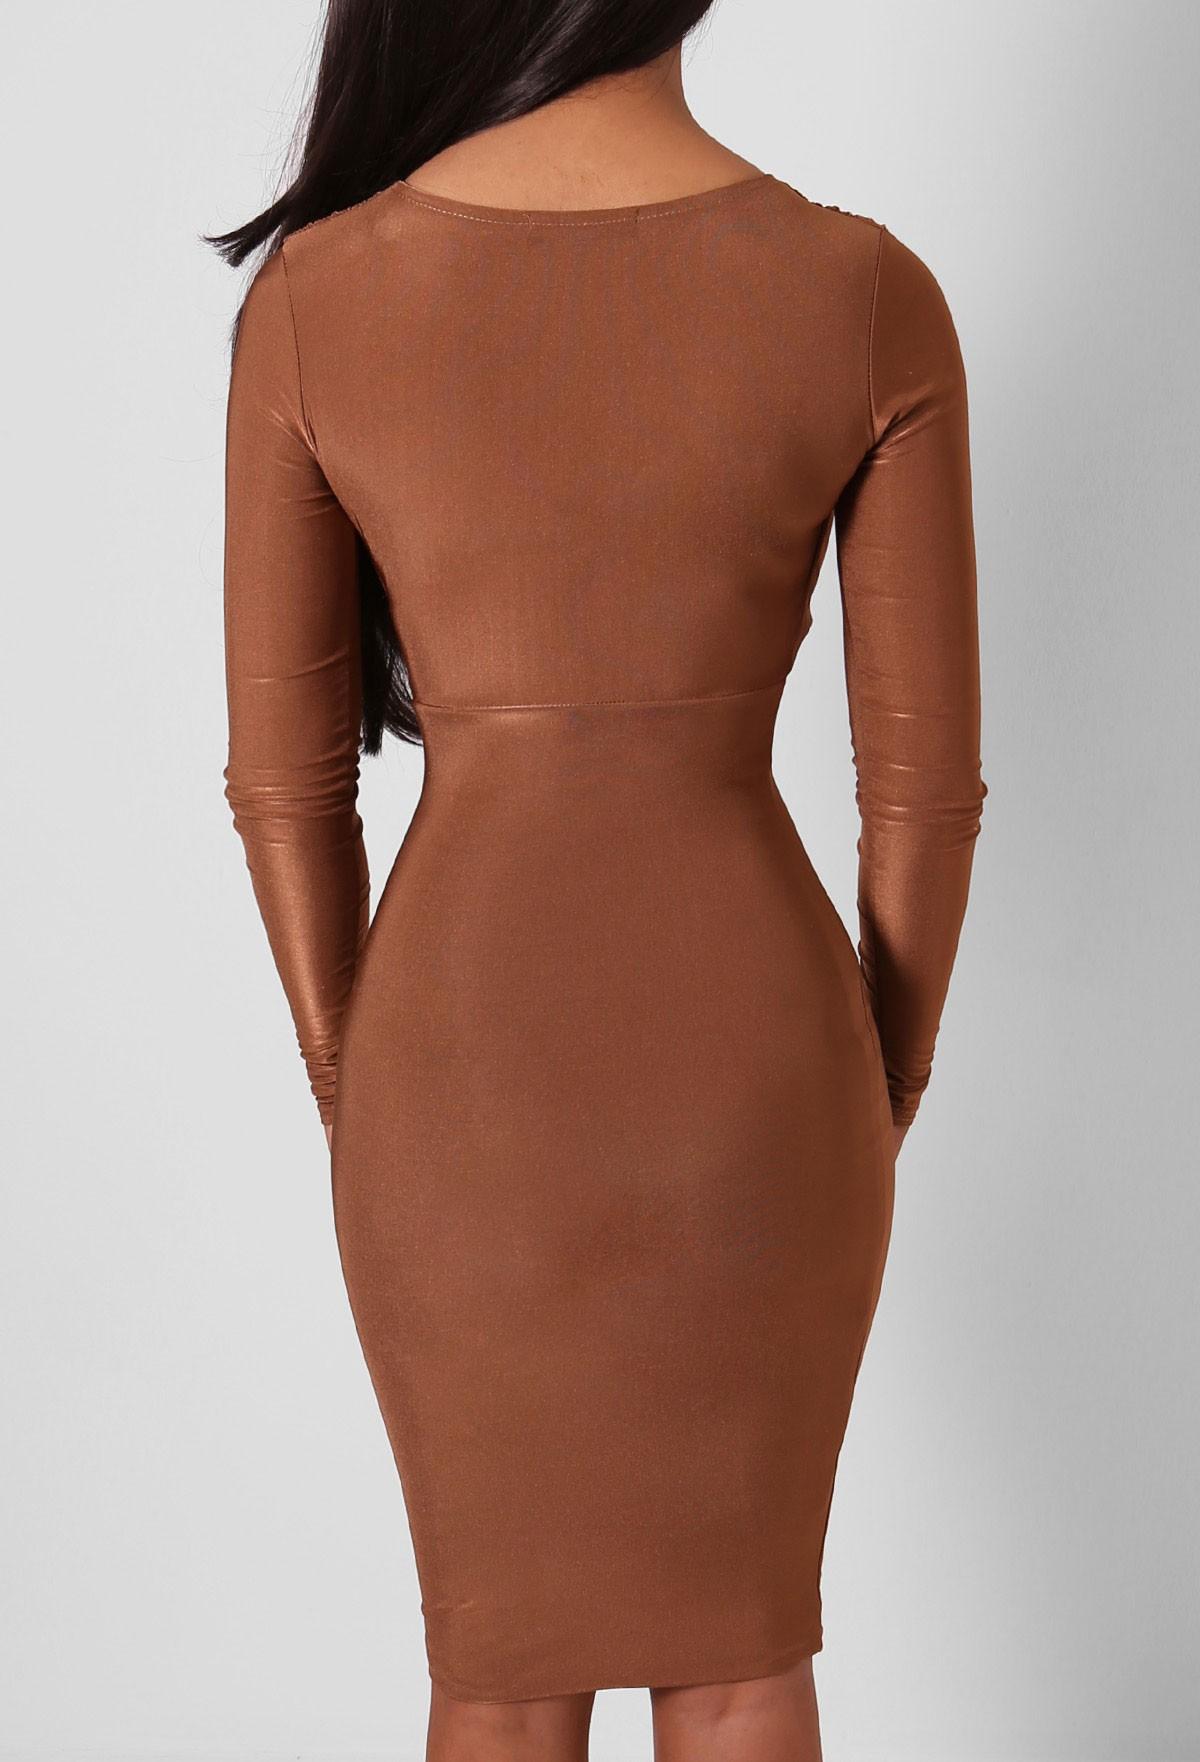 Asos gold sequin skirt 2017